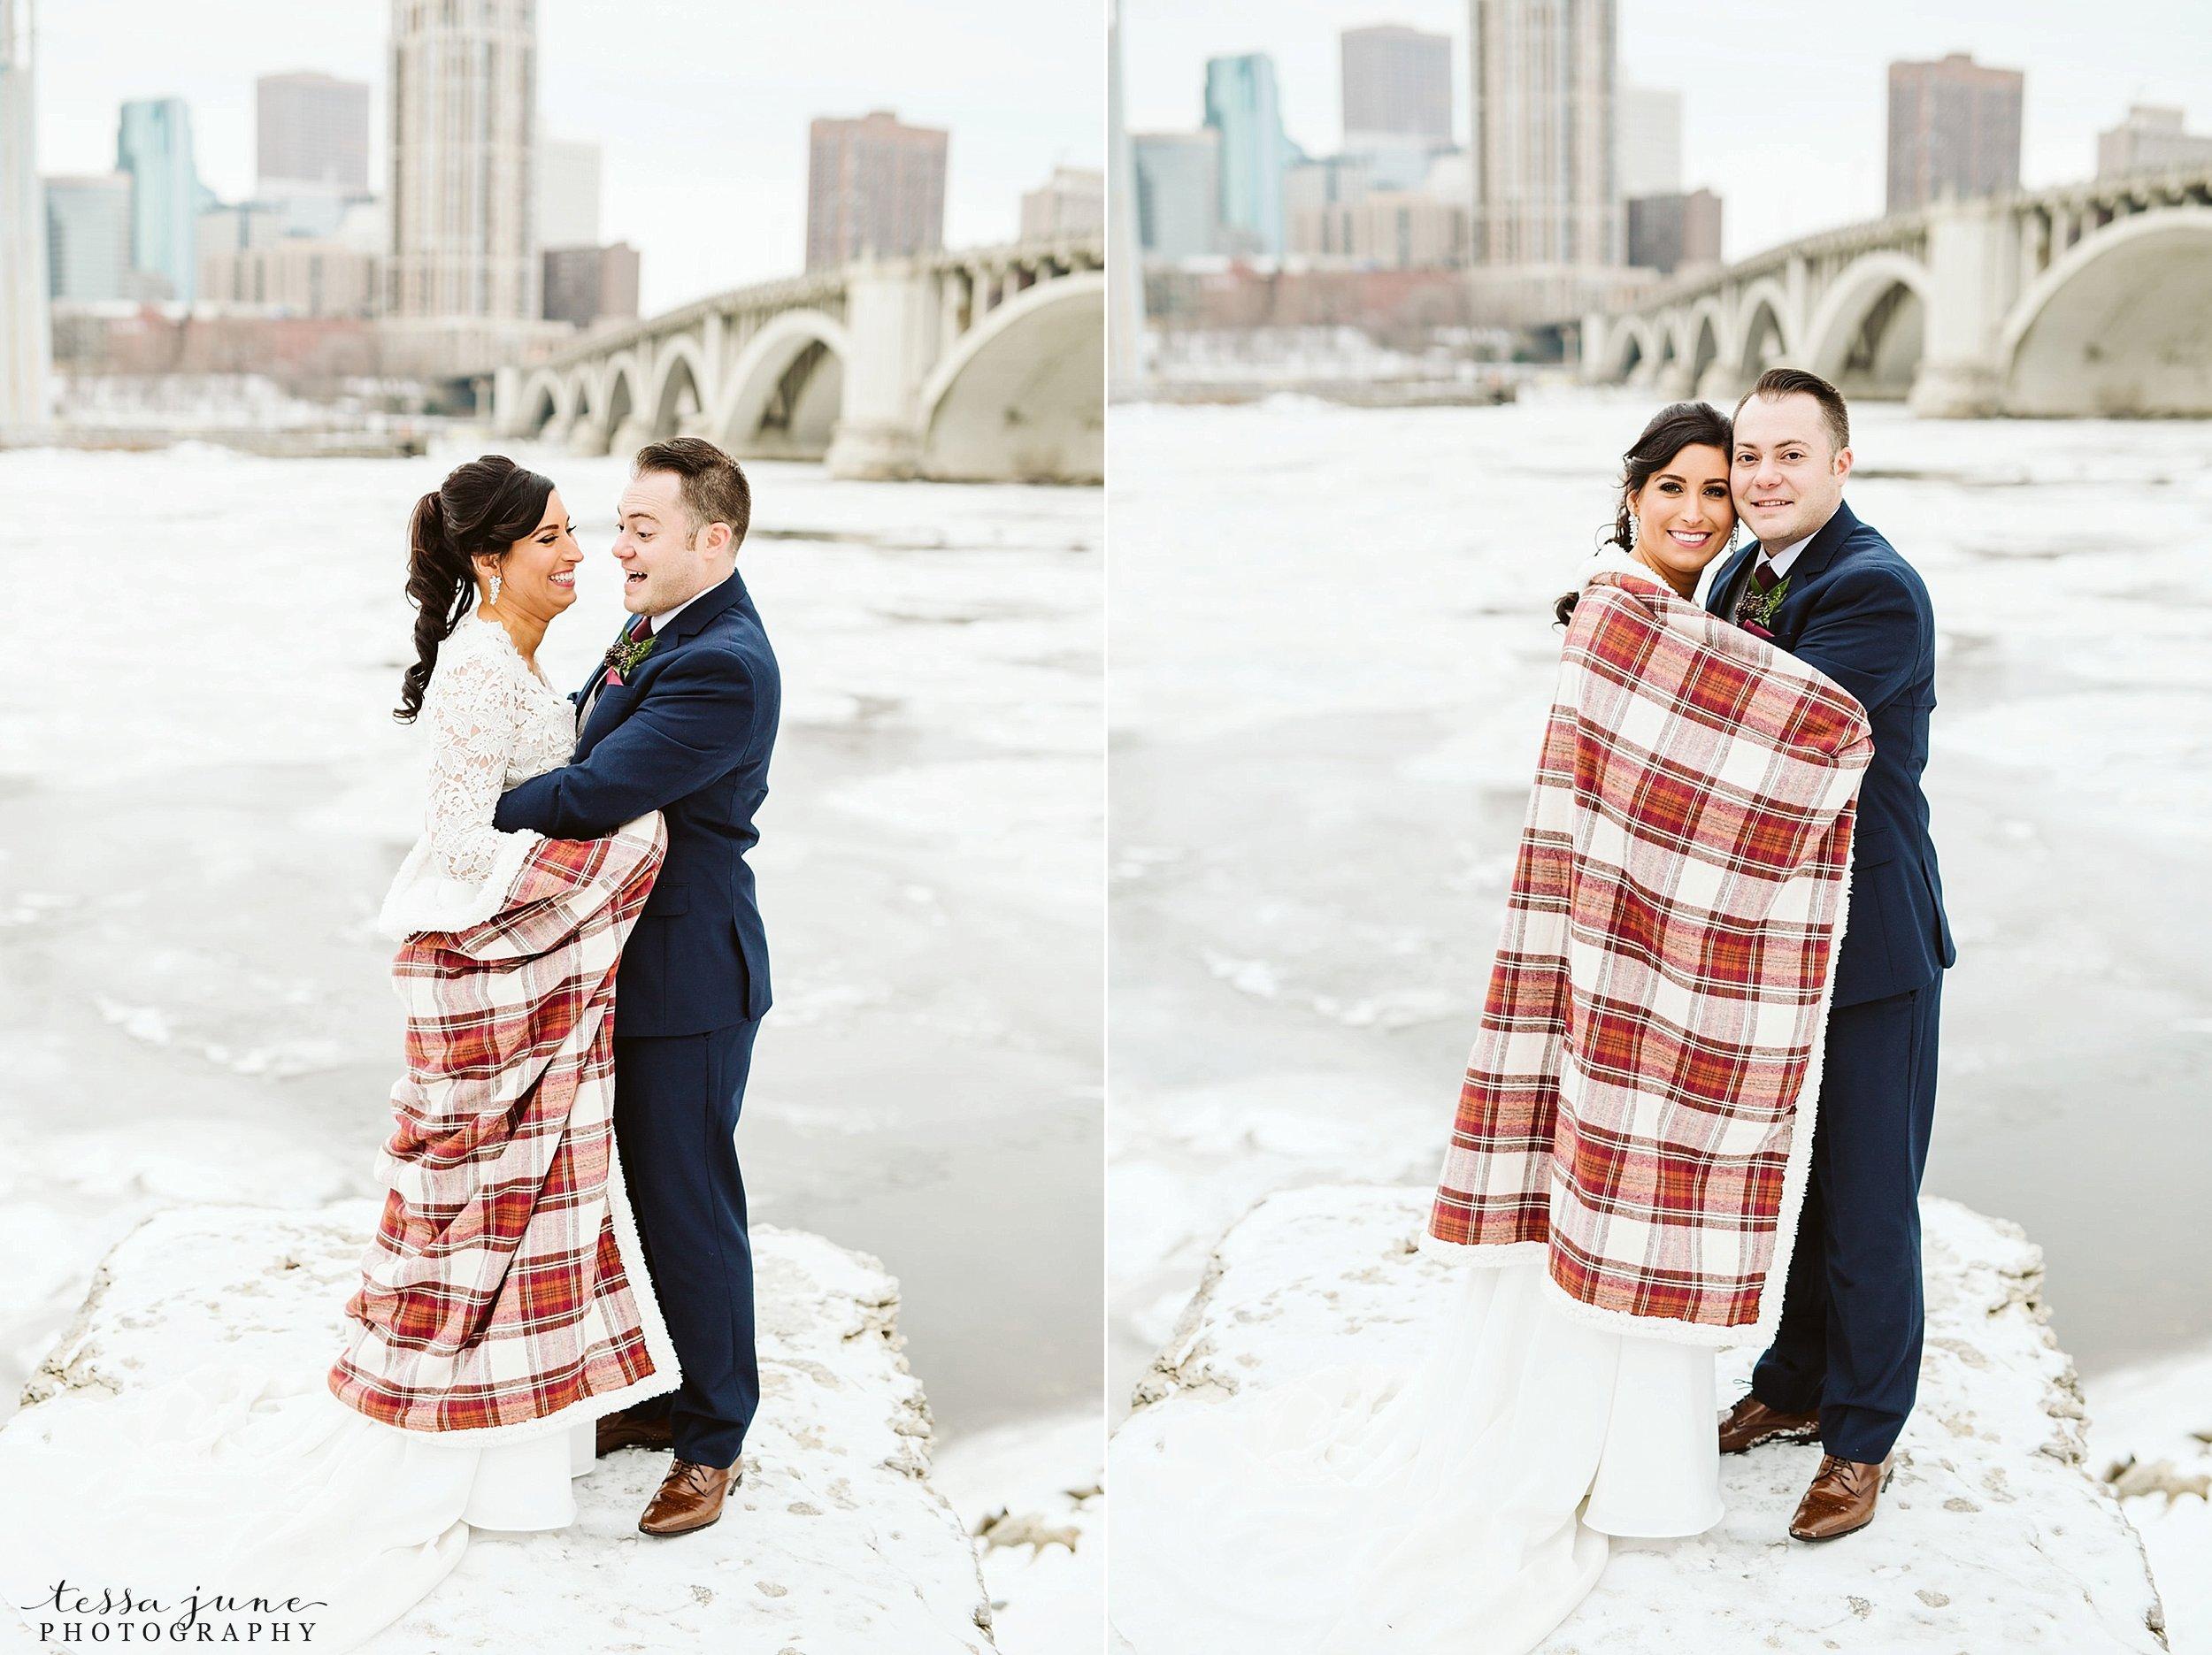 minneapolis-event-center-winter-romantic-snow-wedding-december-85.jpg